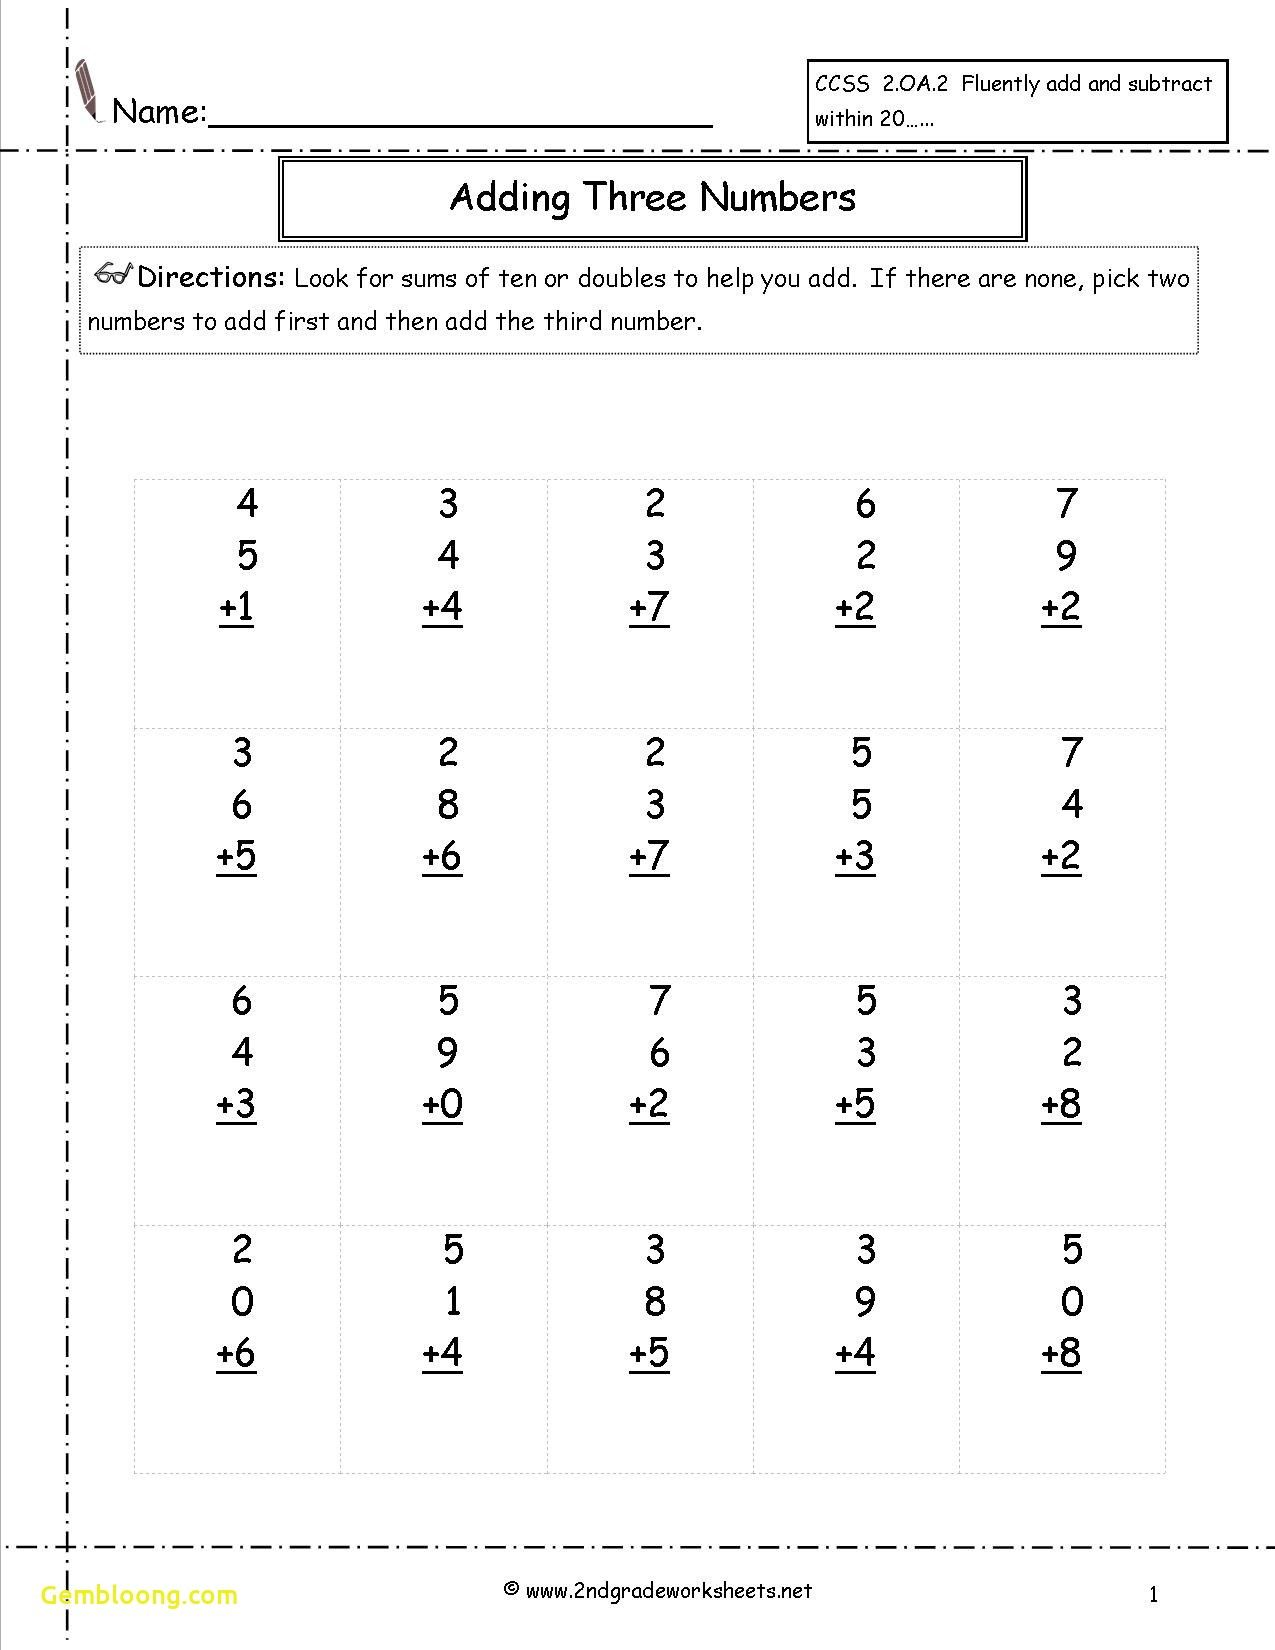 Inspirational Math Worksheets 1st Grade Addition And Subtraction Worksheet Printable In 2020 Free Math Worksheets Basic Math Worksheets 2nd Grade Math Worksheets